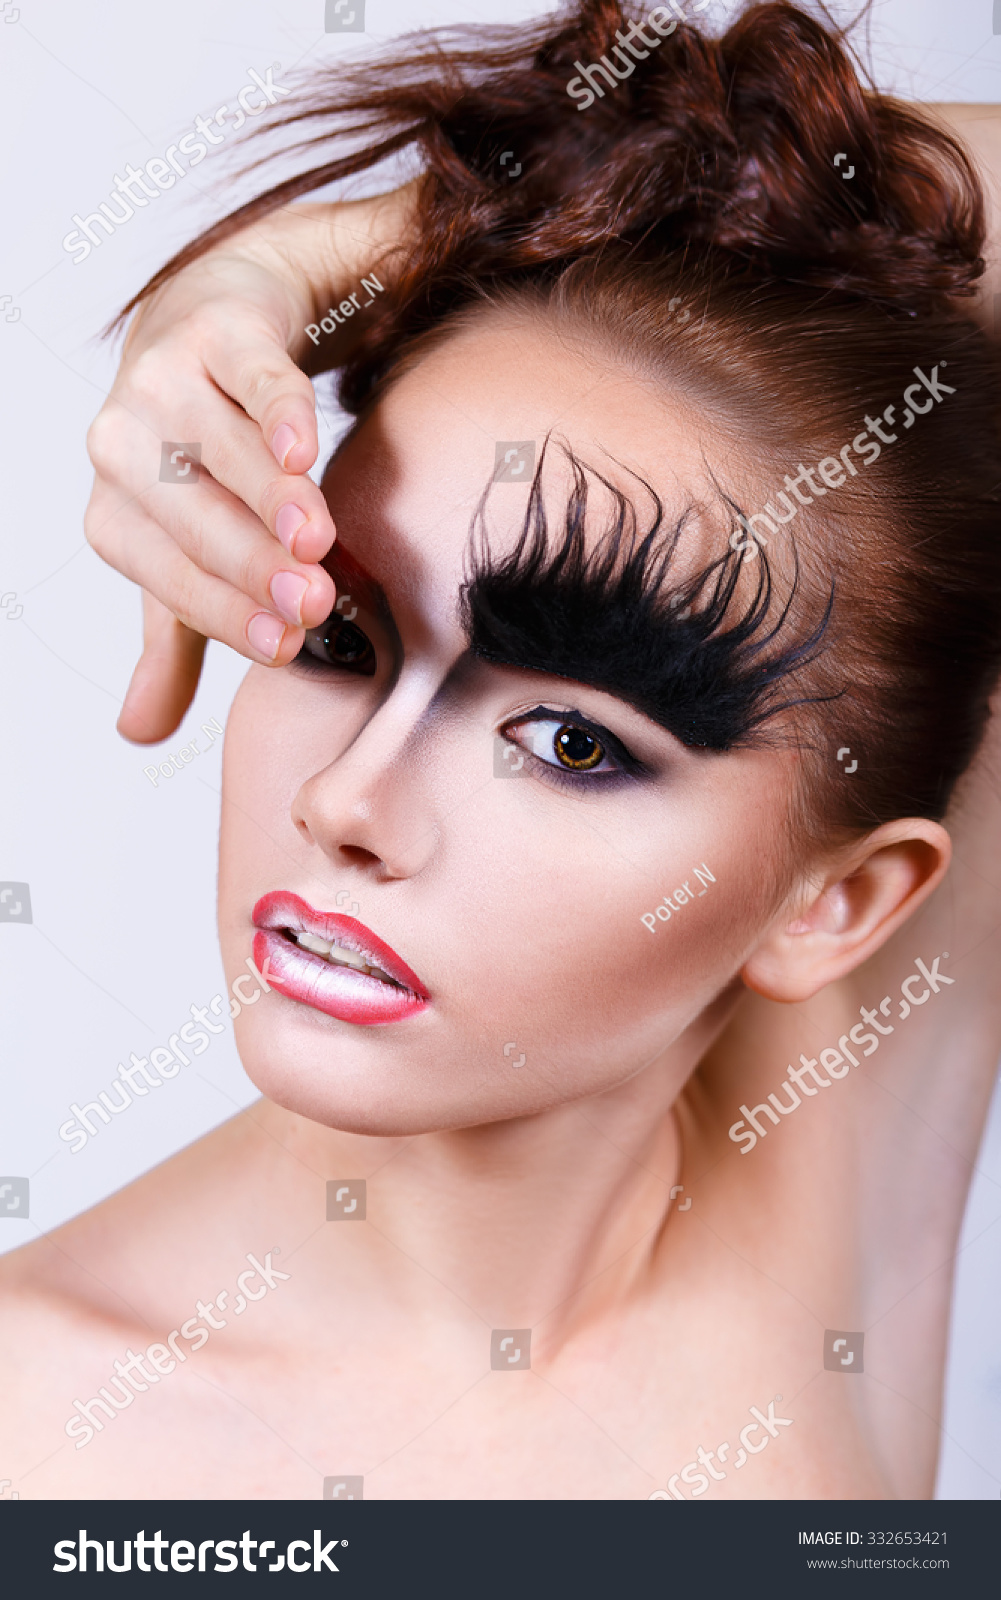 Girl Unusual Makeup Bushy Eyebrows Makeup Stock Photo Edit Now